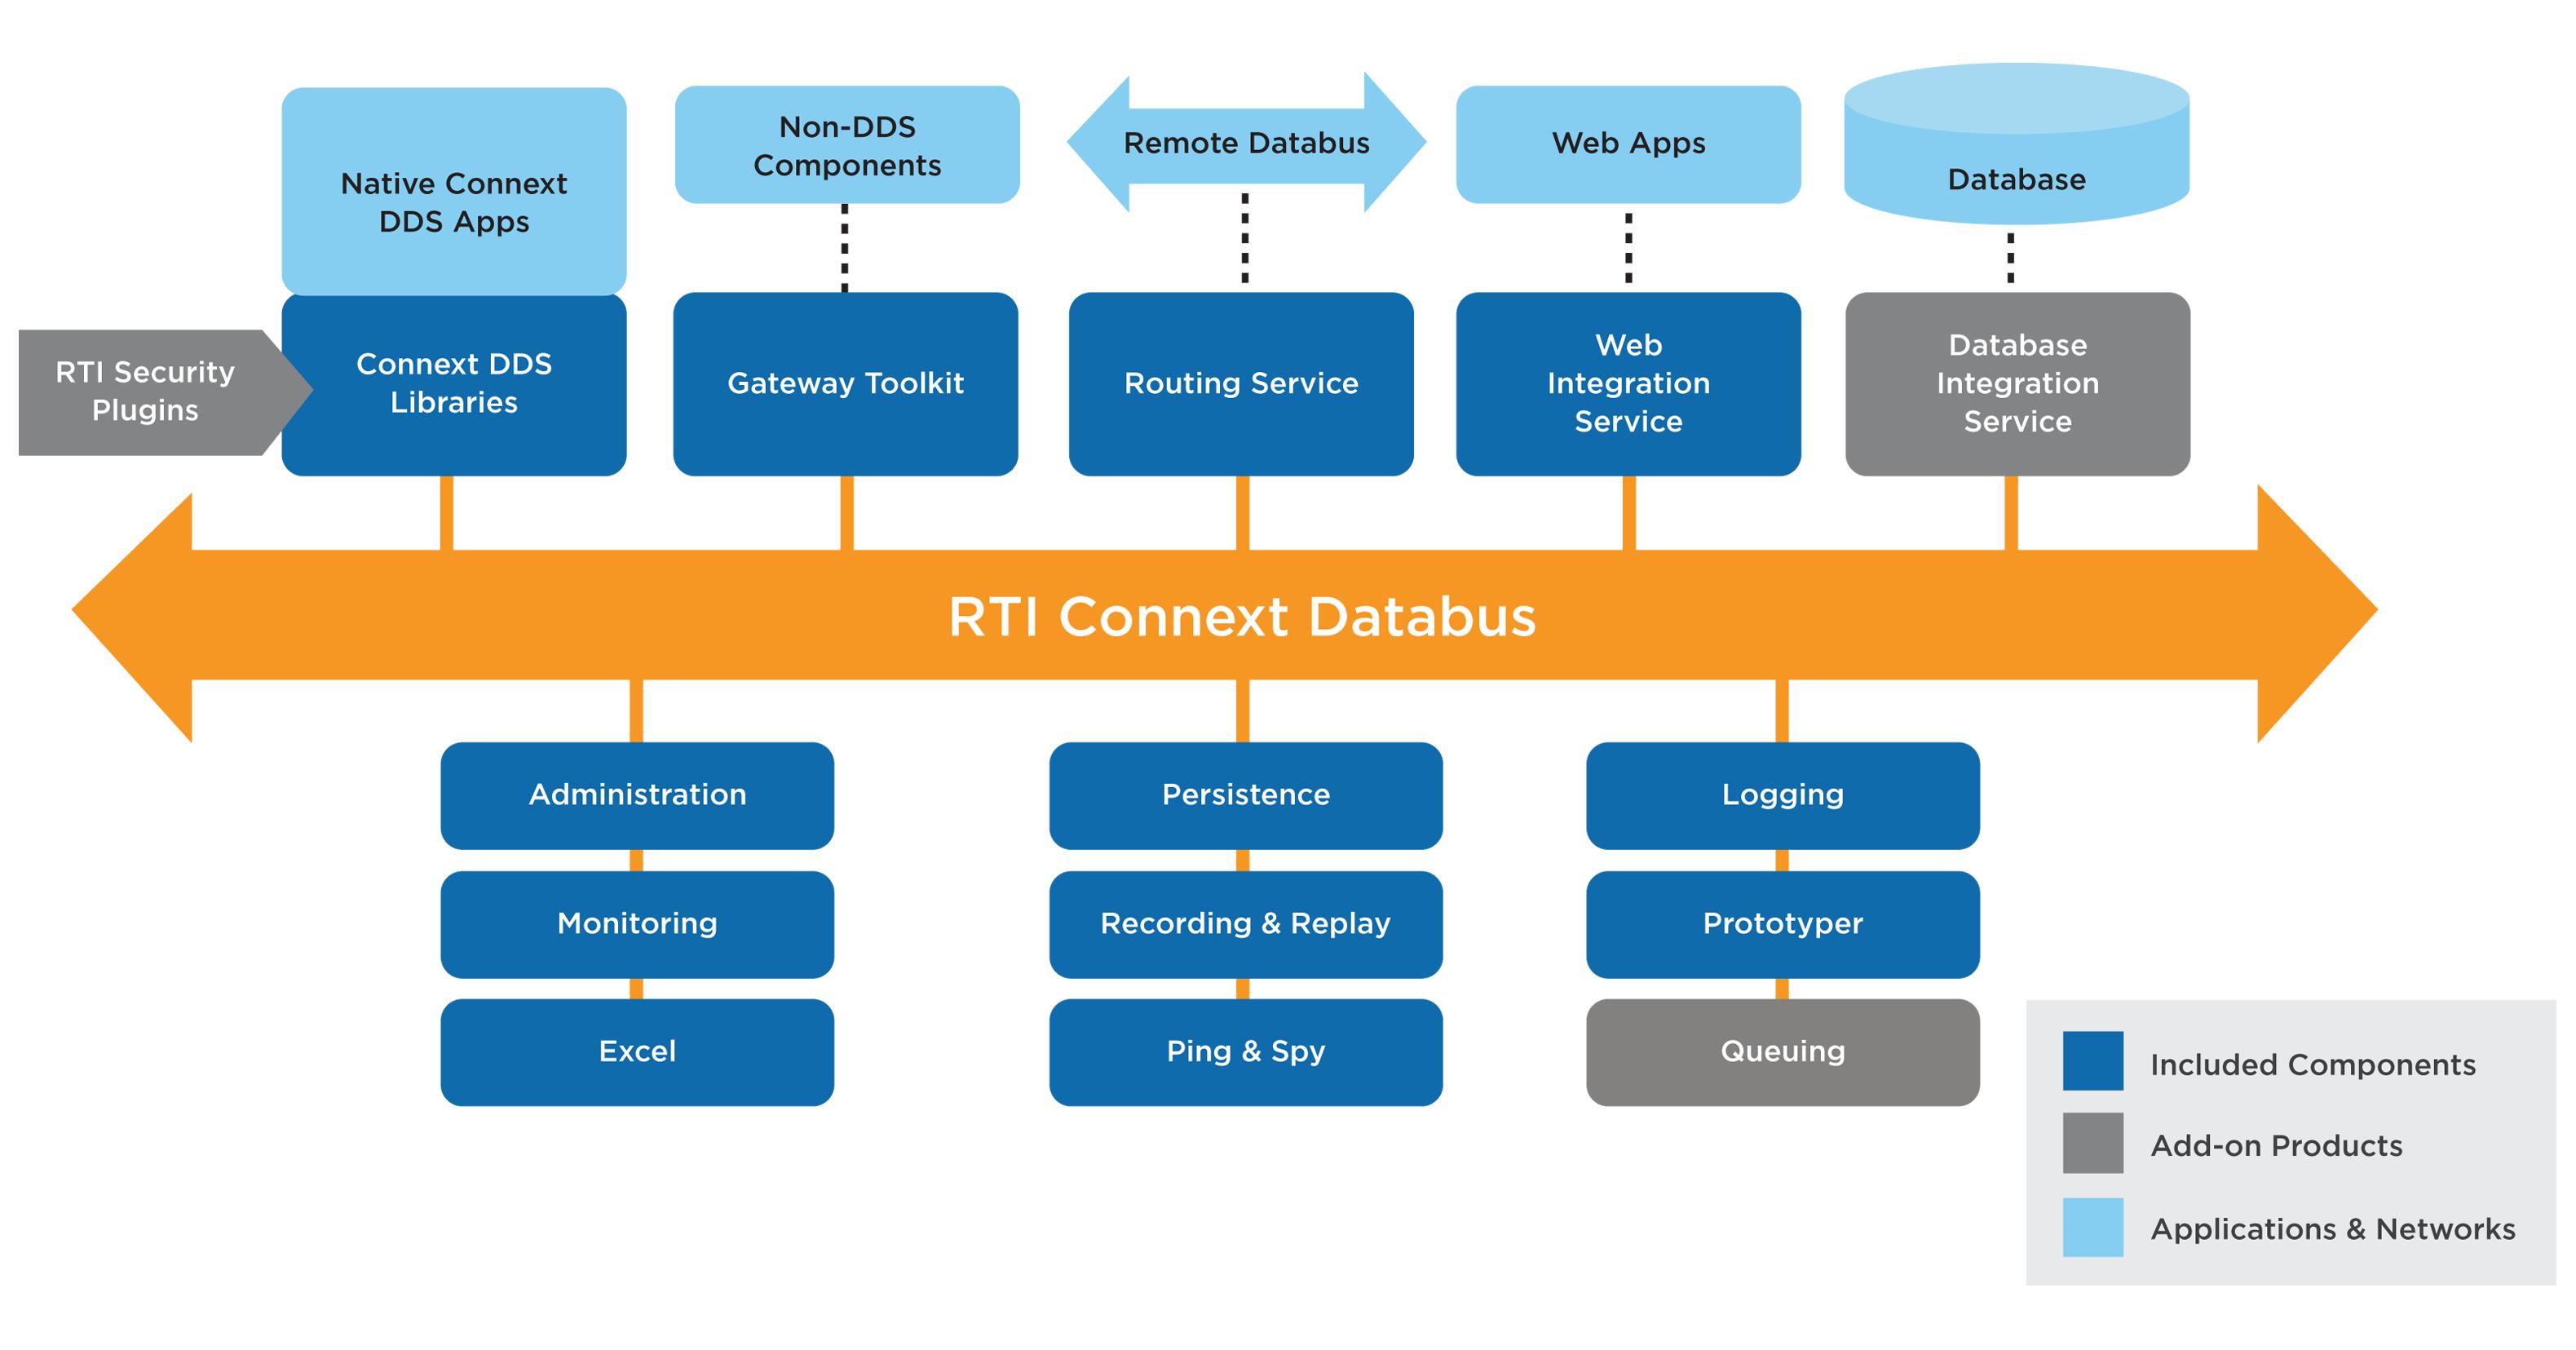 RTI_Diagram_Connext_DDS_Professional